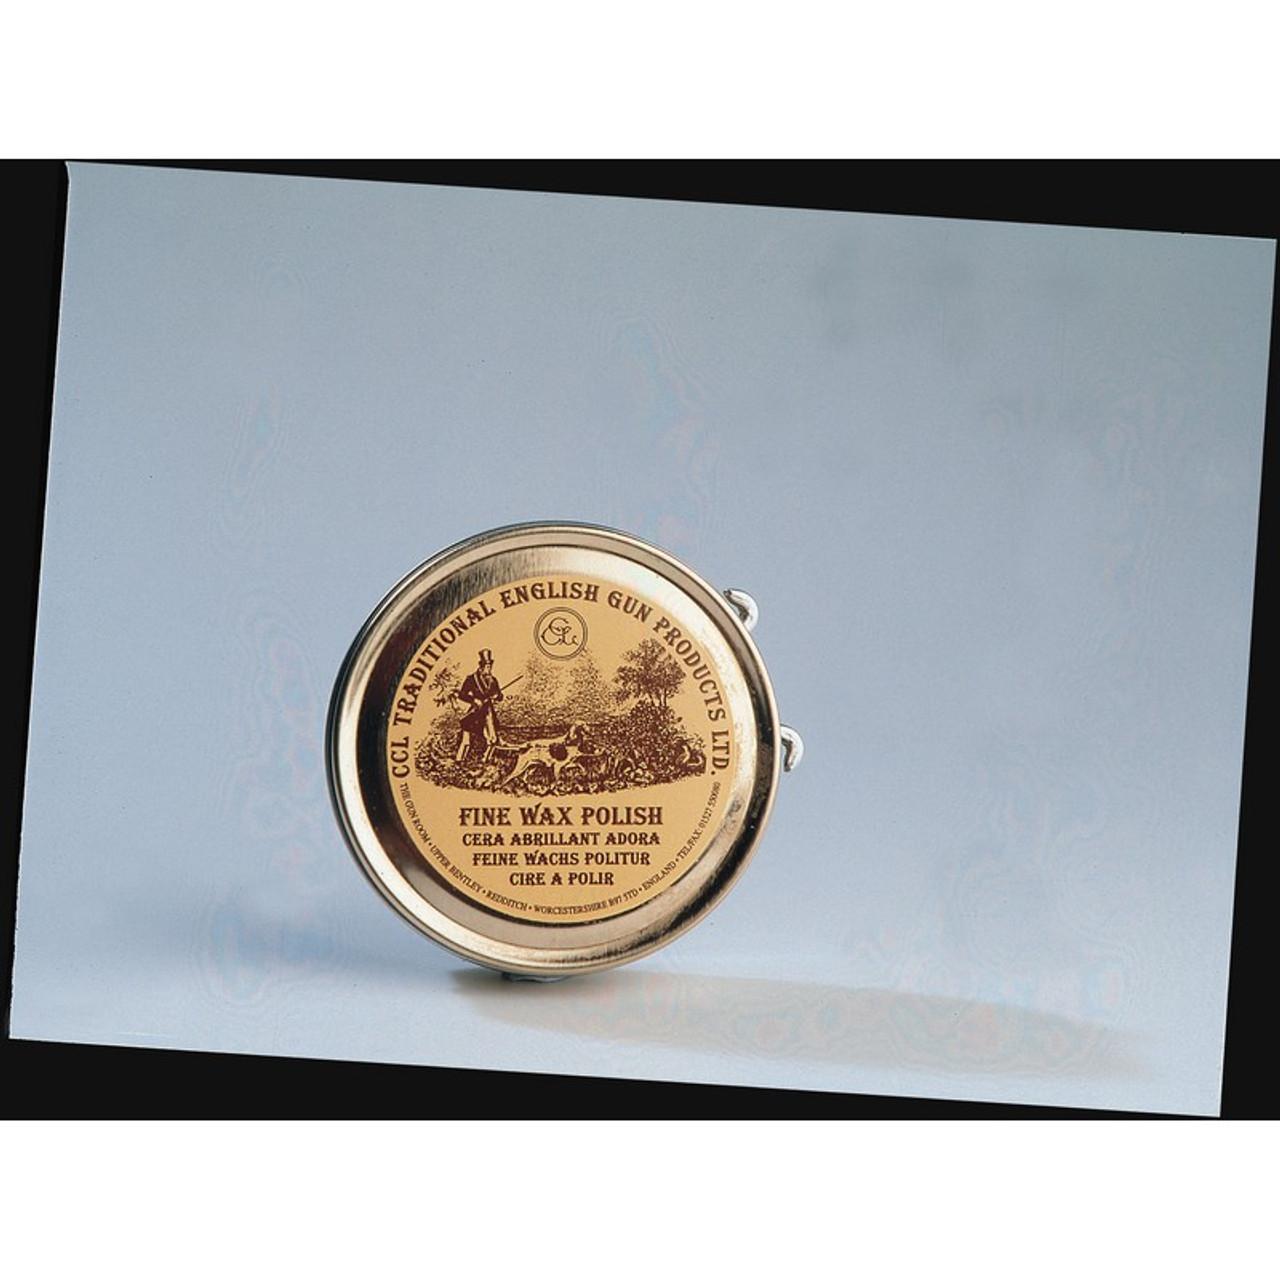 Best price for CCL Gunstock Wax Polish, on sale from Bradford Stalker